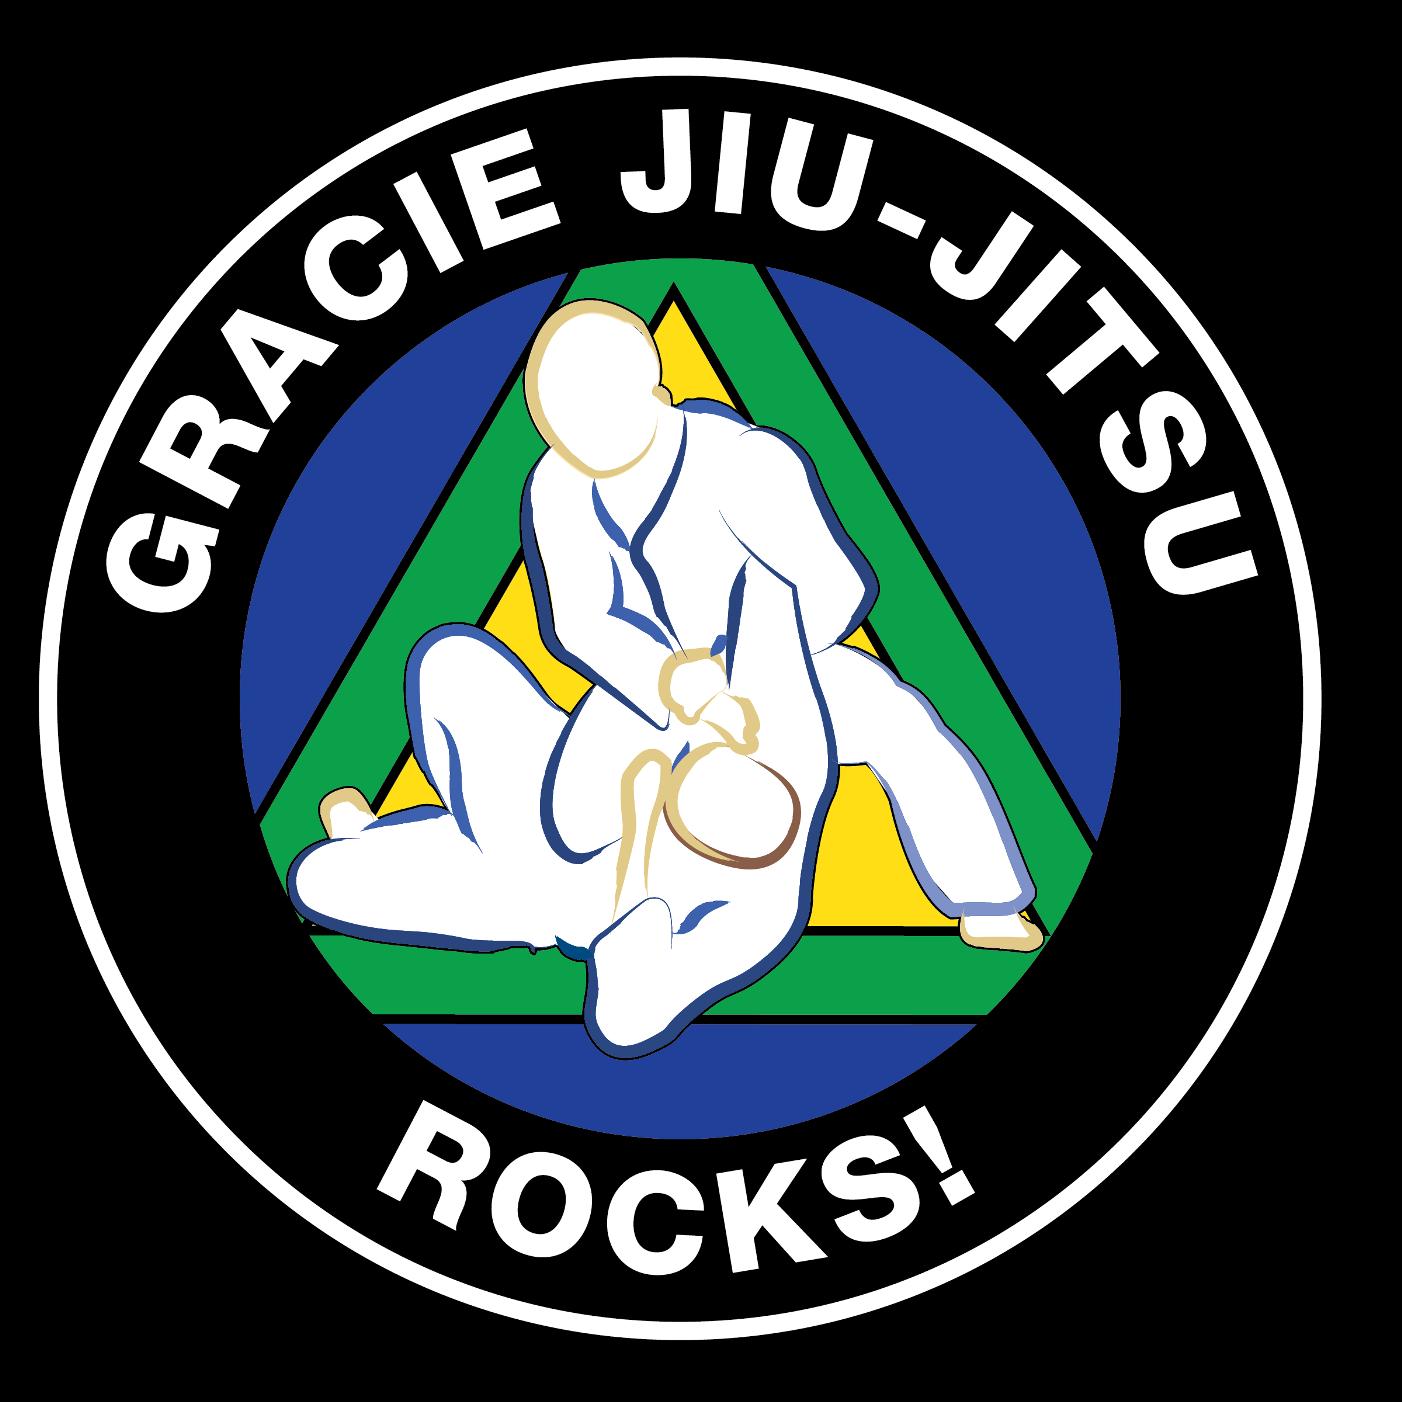 Gracie Jiu Jitsu Rocks! podcast show image